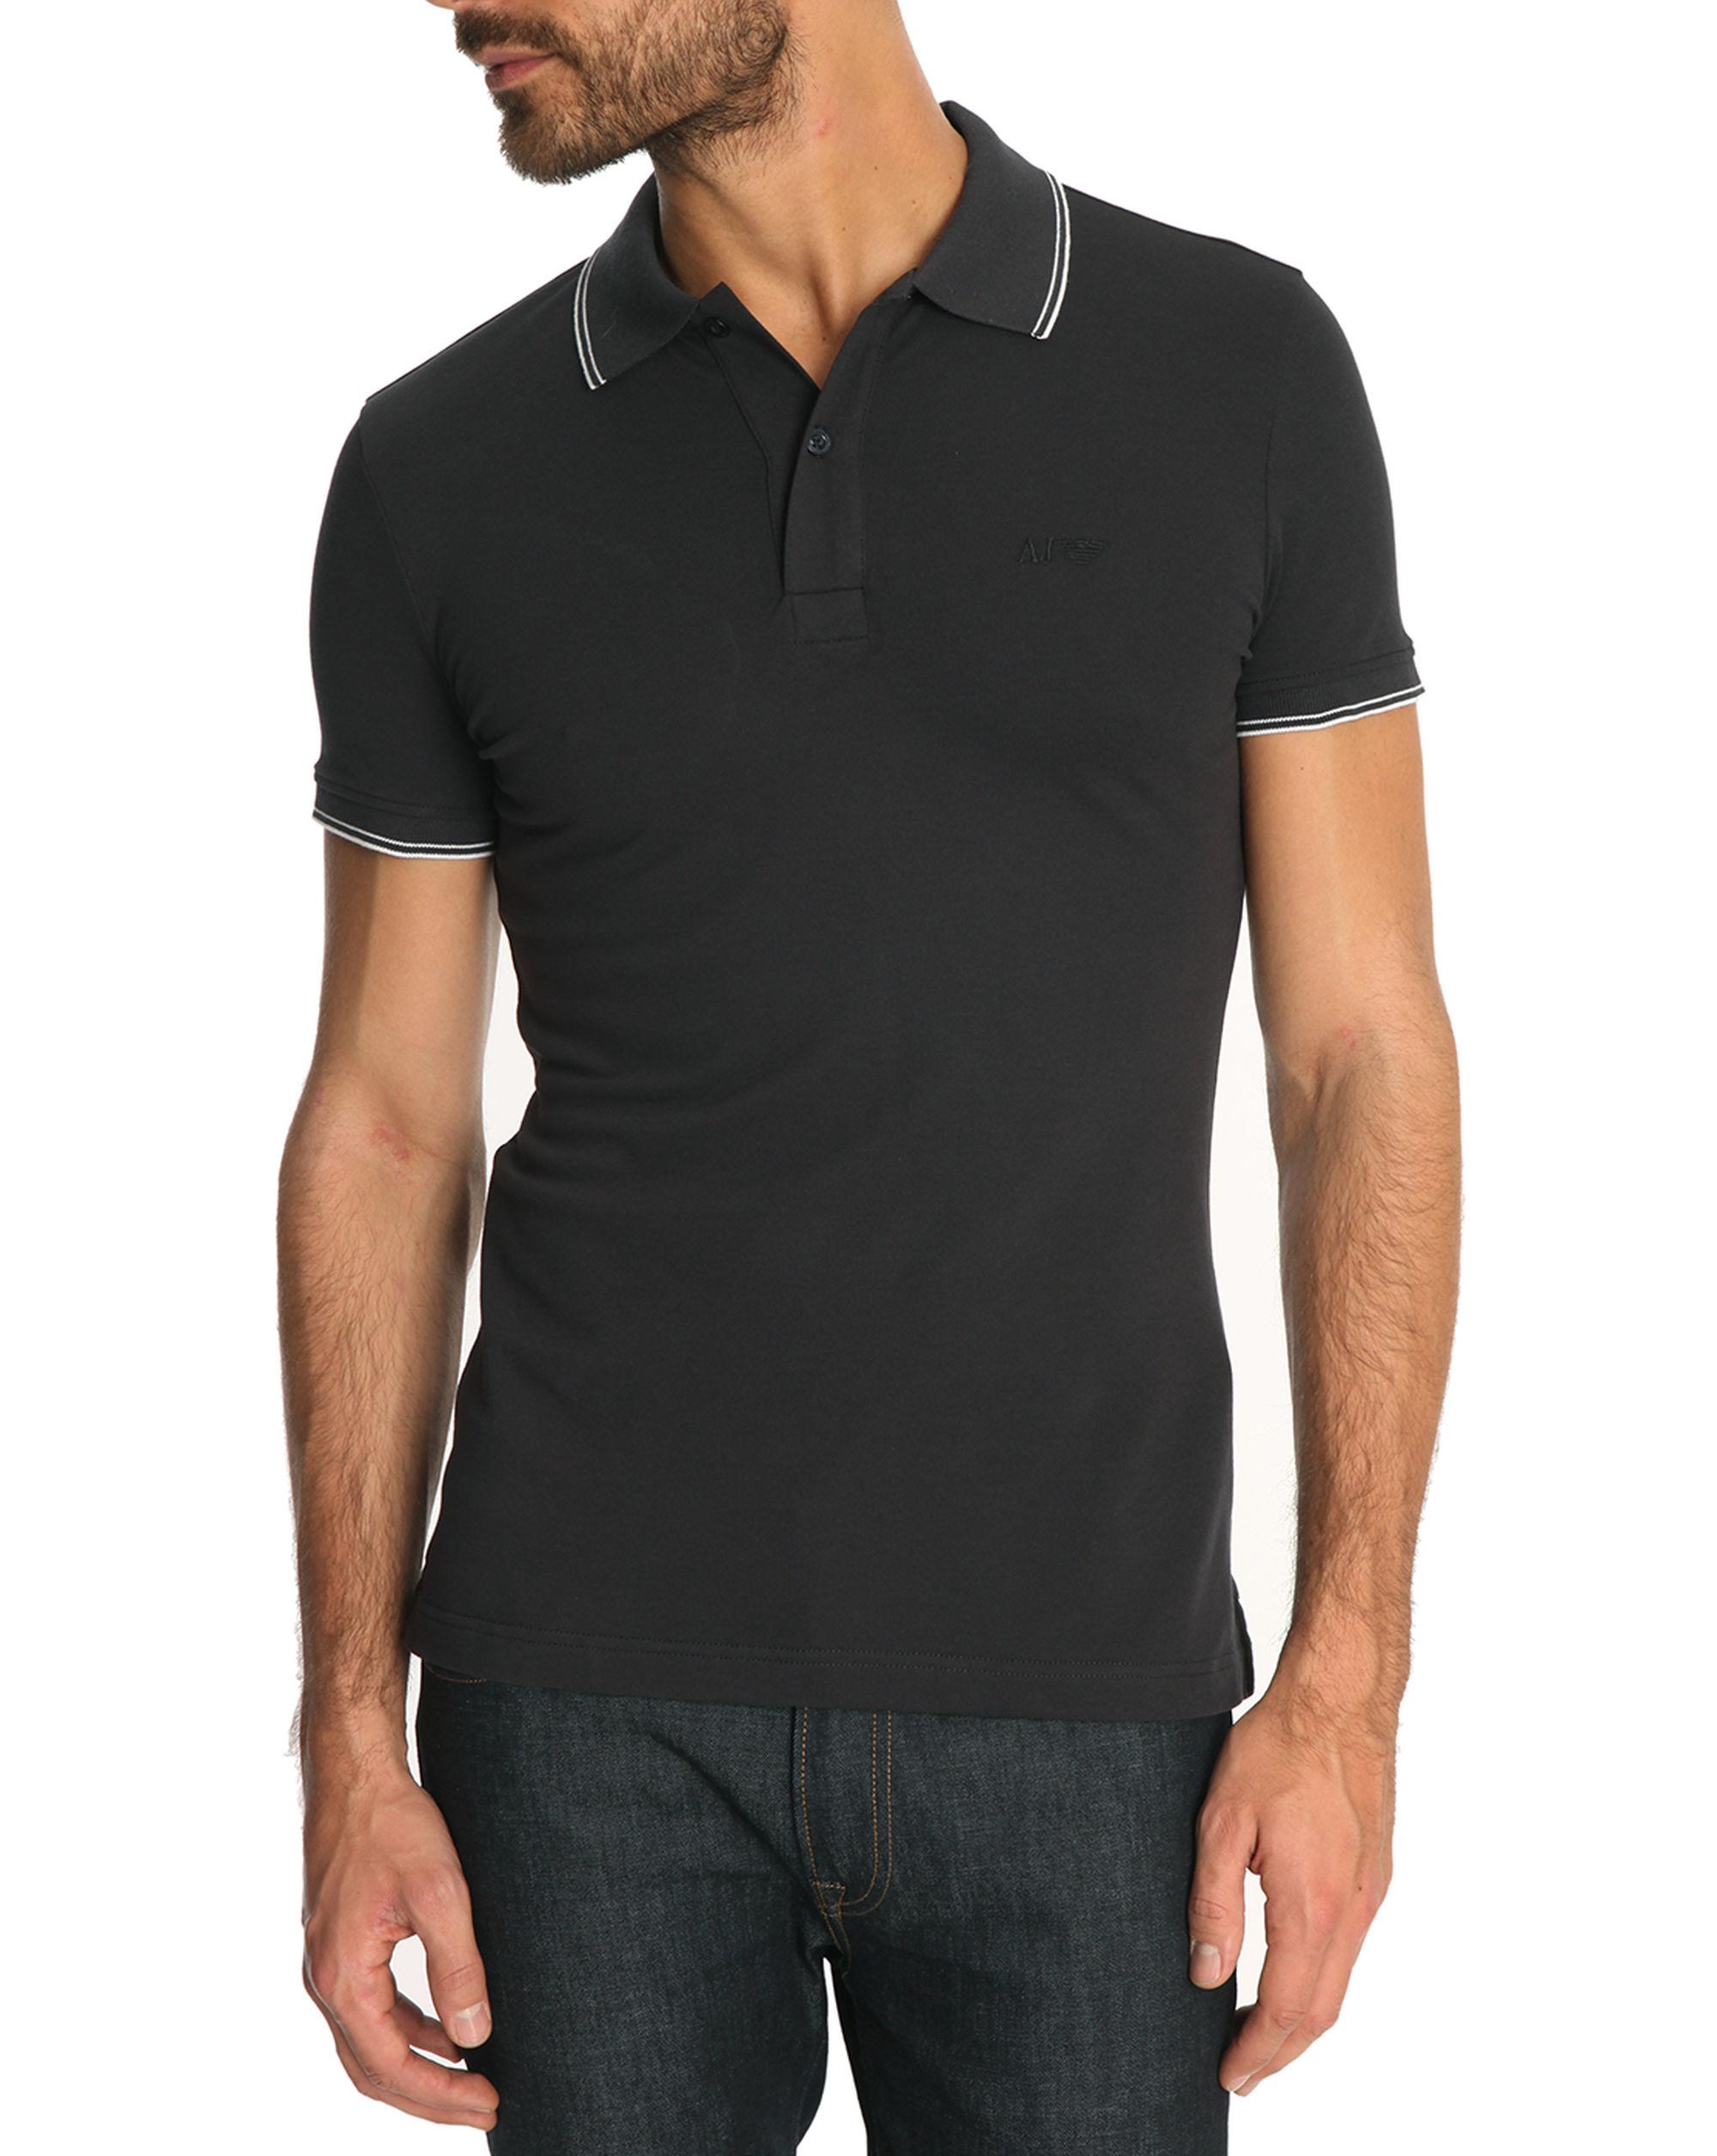 6a985e62ba0 Armani Jeans Slim Polo T Shirt White - BCD Tofu House